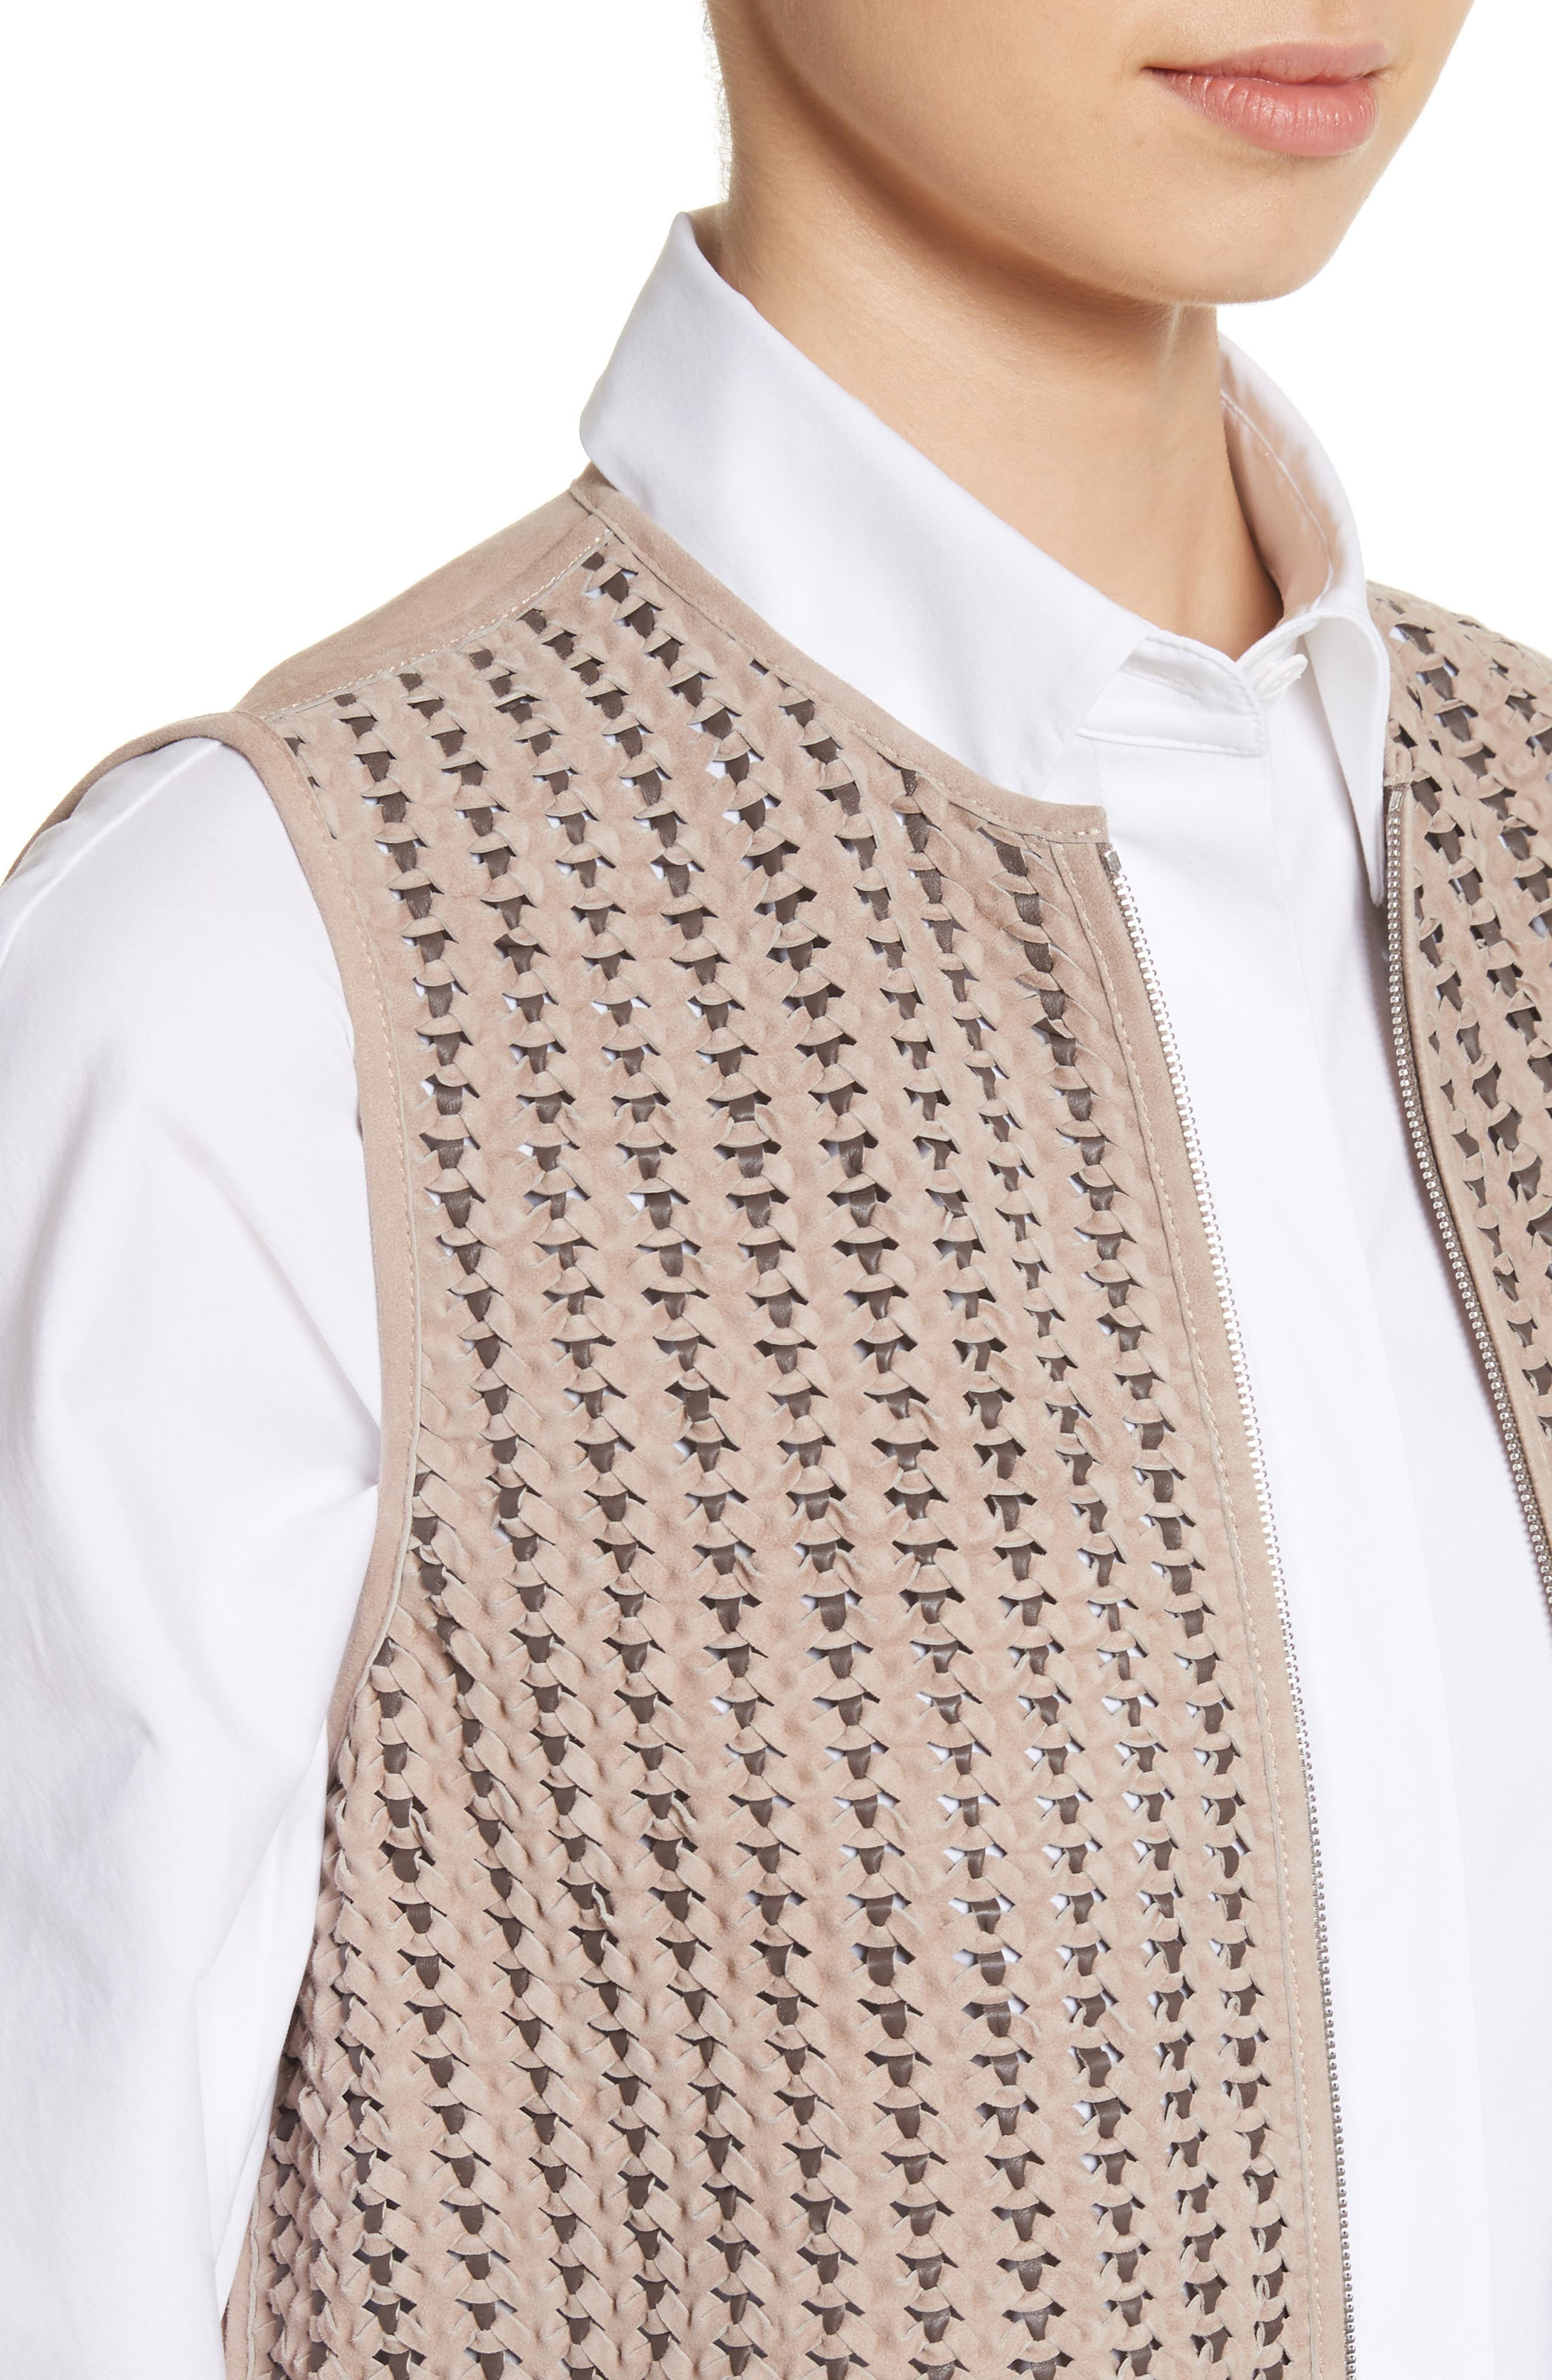 Laritza Braided Leather Vest,                             Alternate thumbnail 4, color,                             Osprey